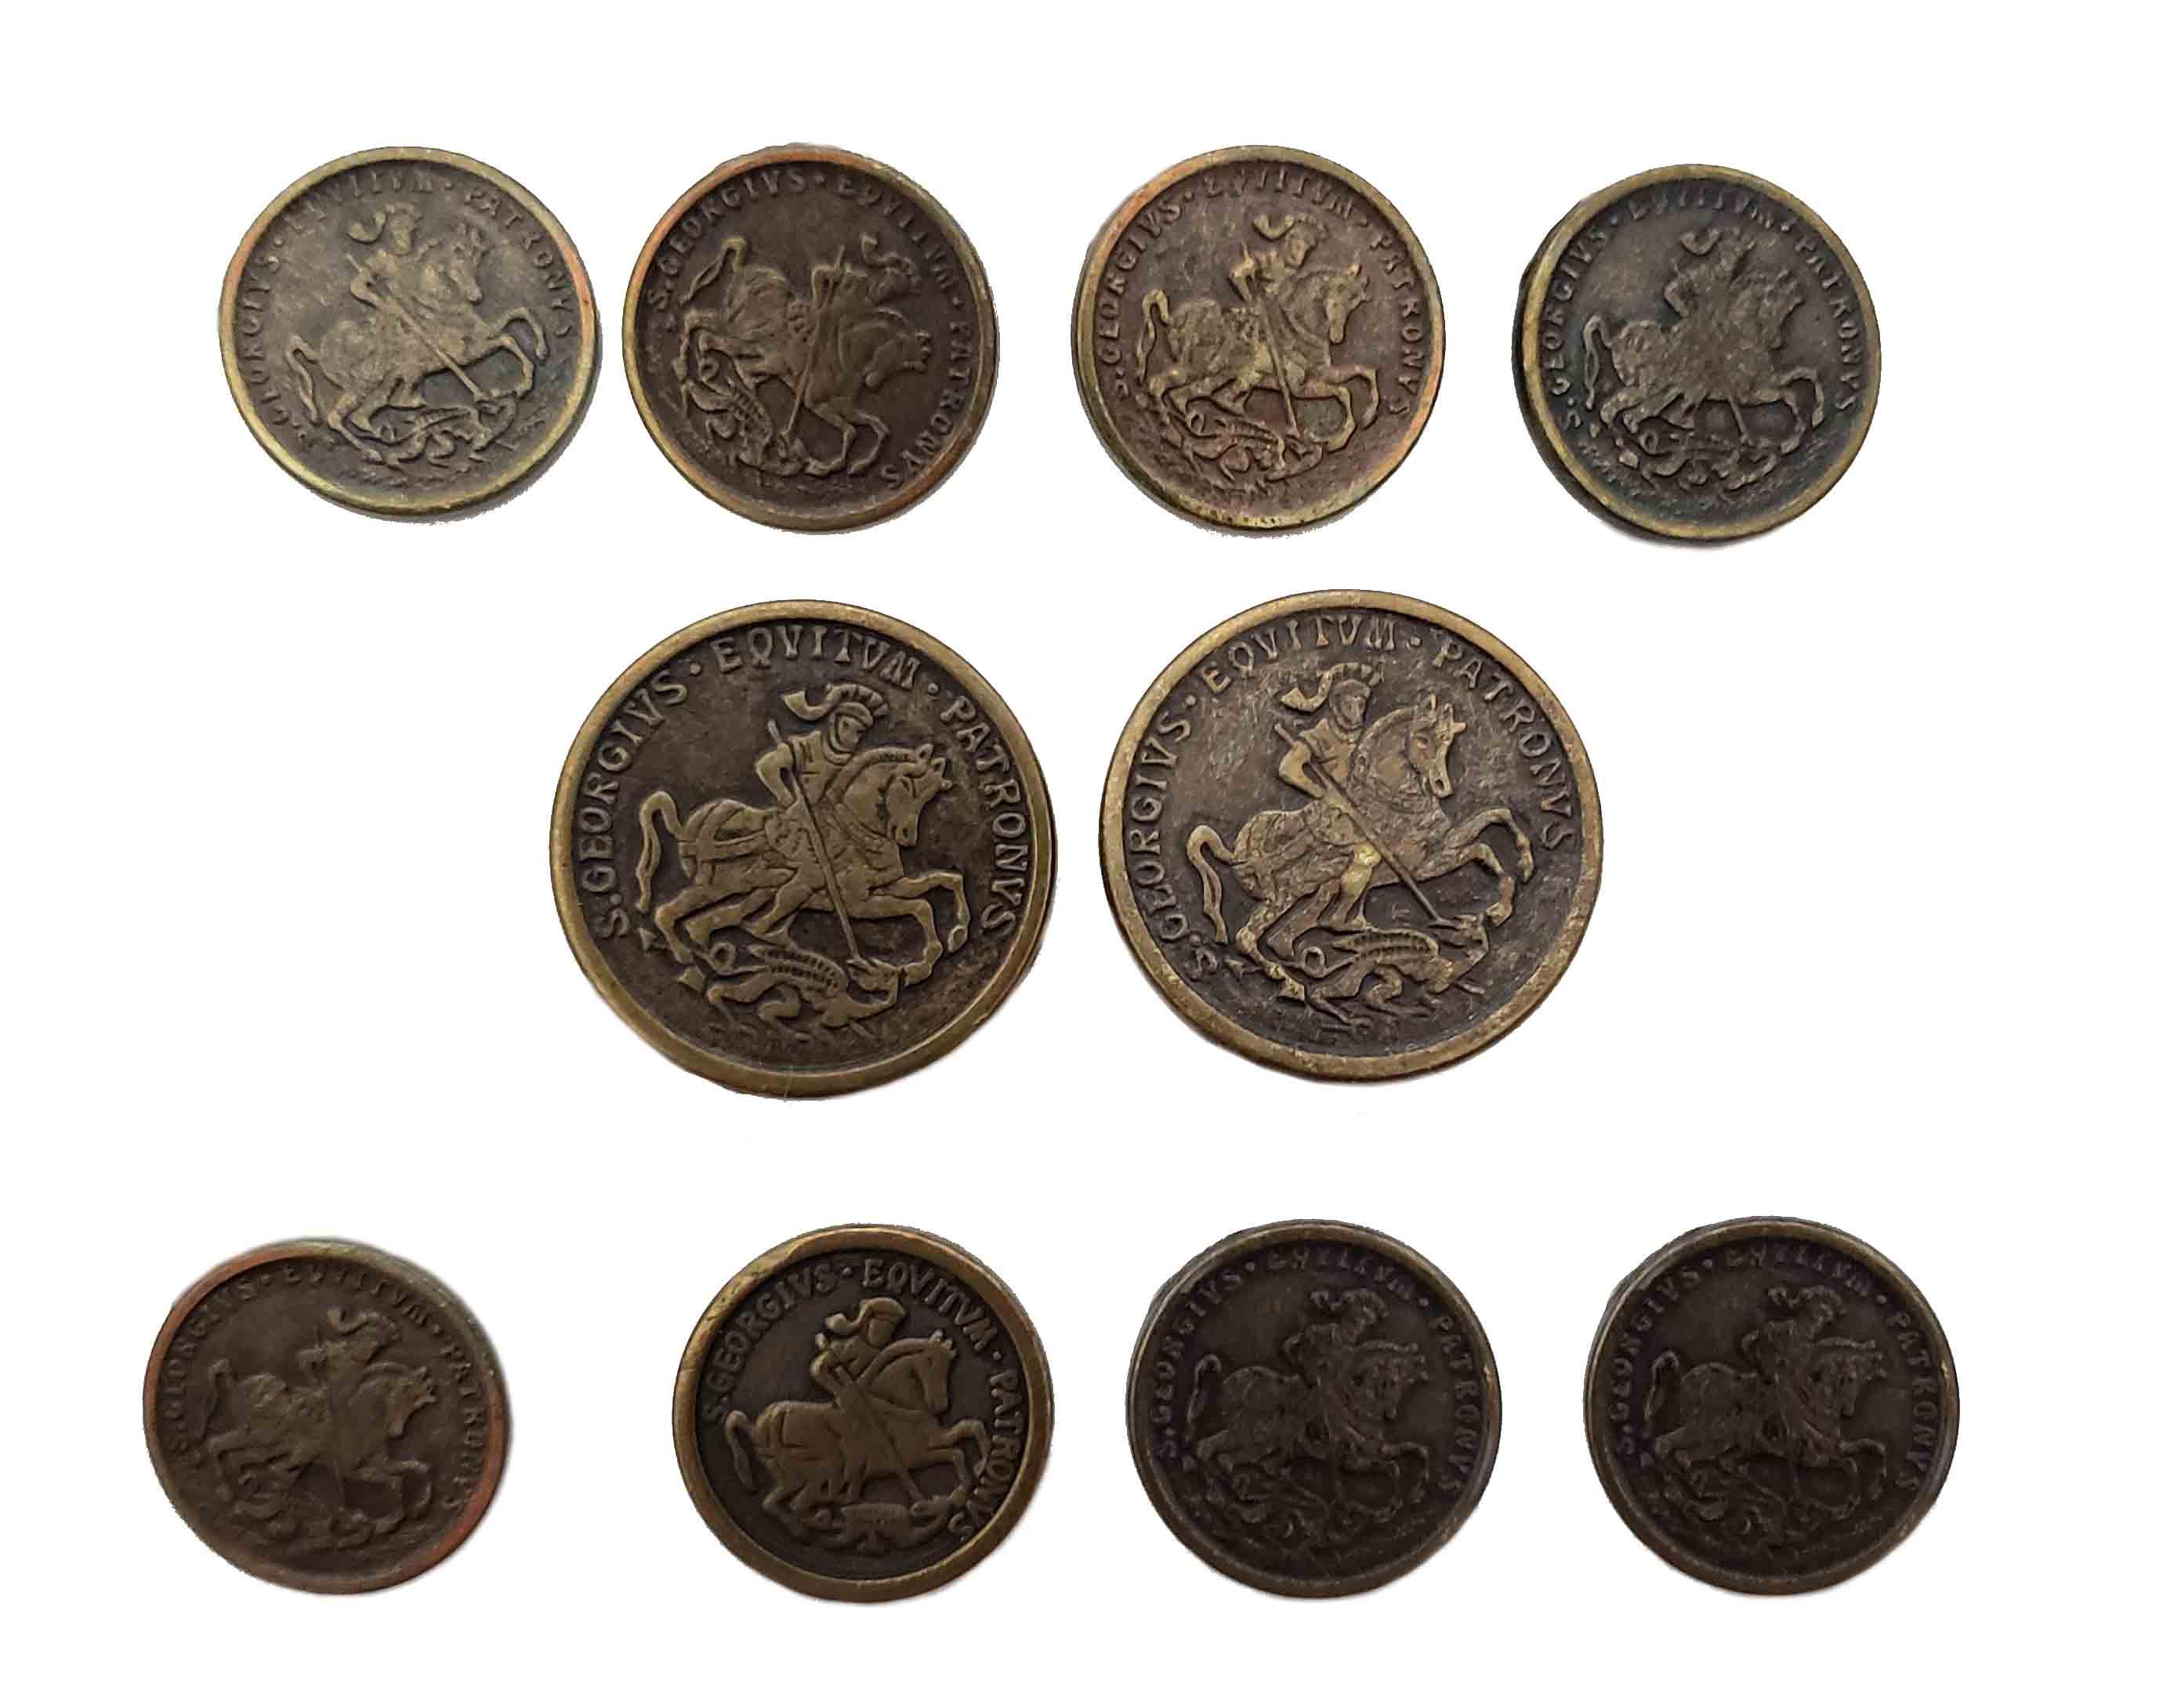 Vintage Pierre Cardin Blazer Buttons Set Antique Gold Brown Shank Brass Alloy Roman Horseman Pattern Men's